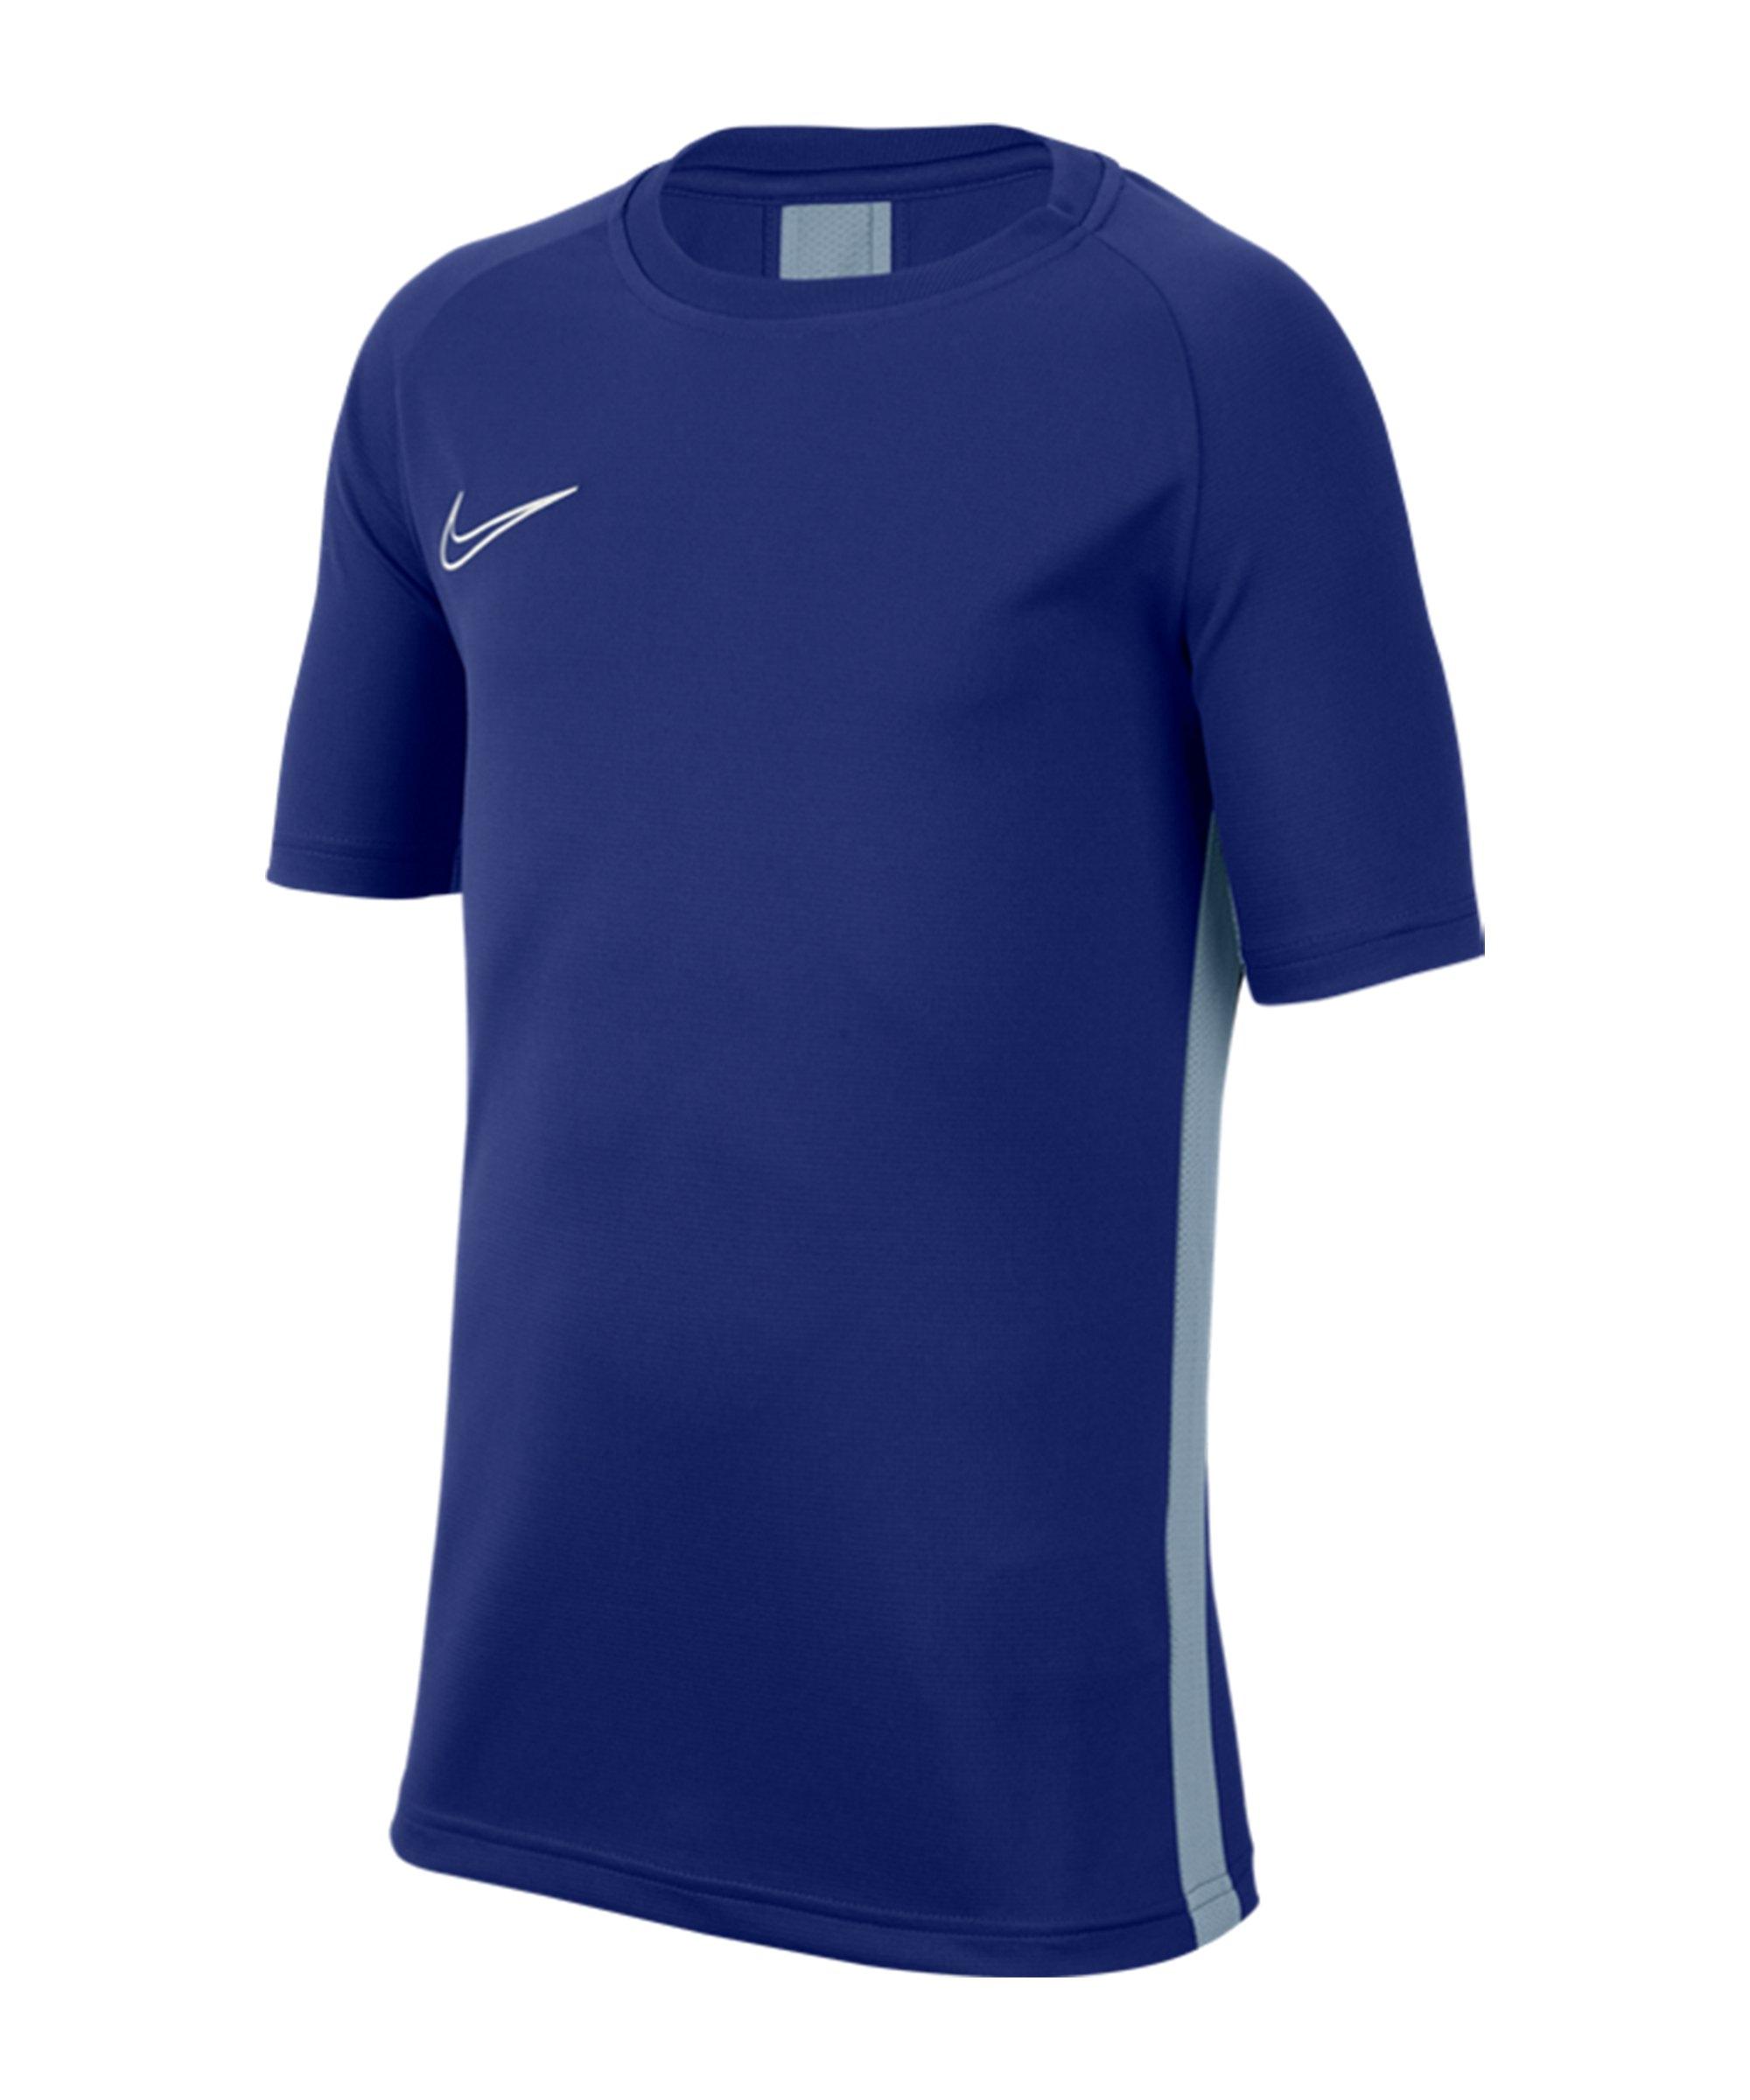 Nike Academy Dri-FIT Top T-Shirt Kids Blau F455 - blau